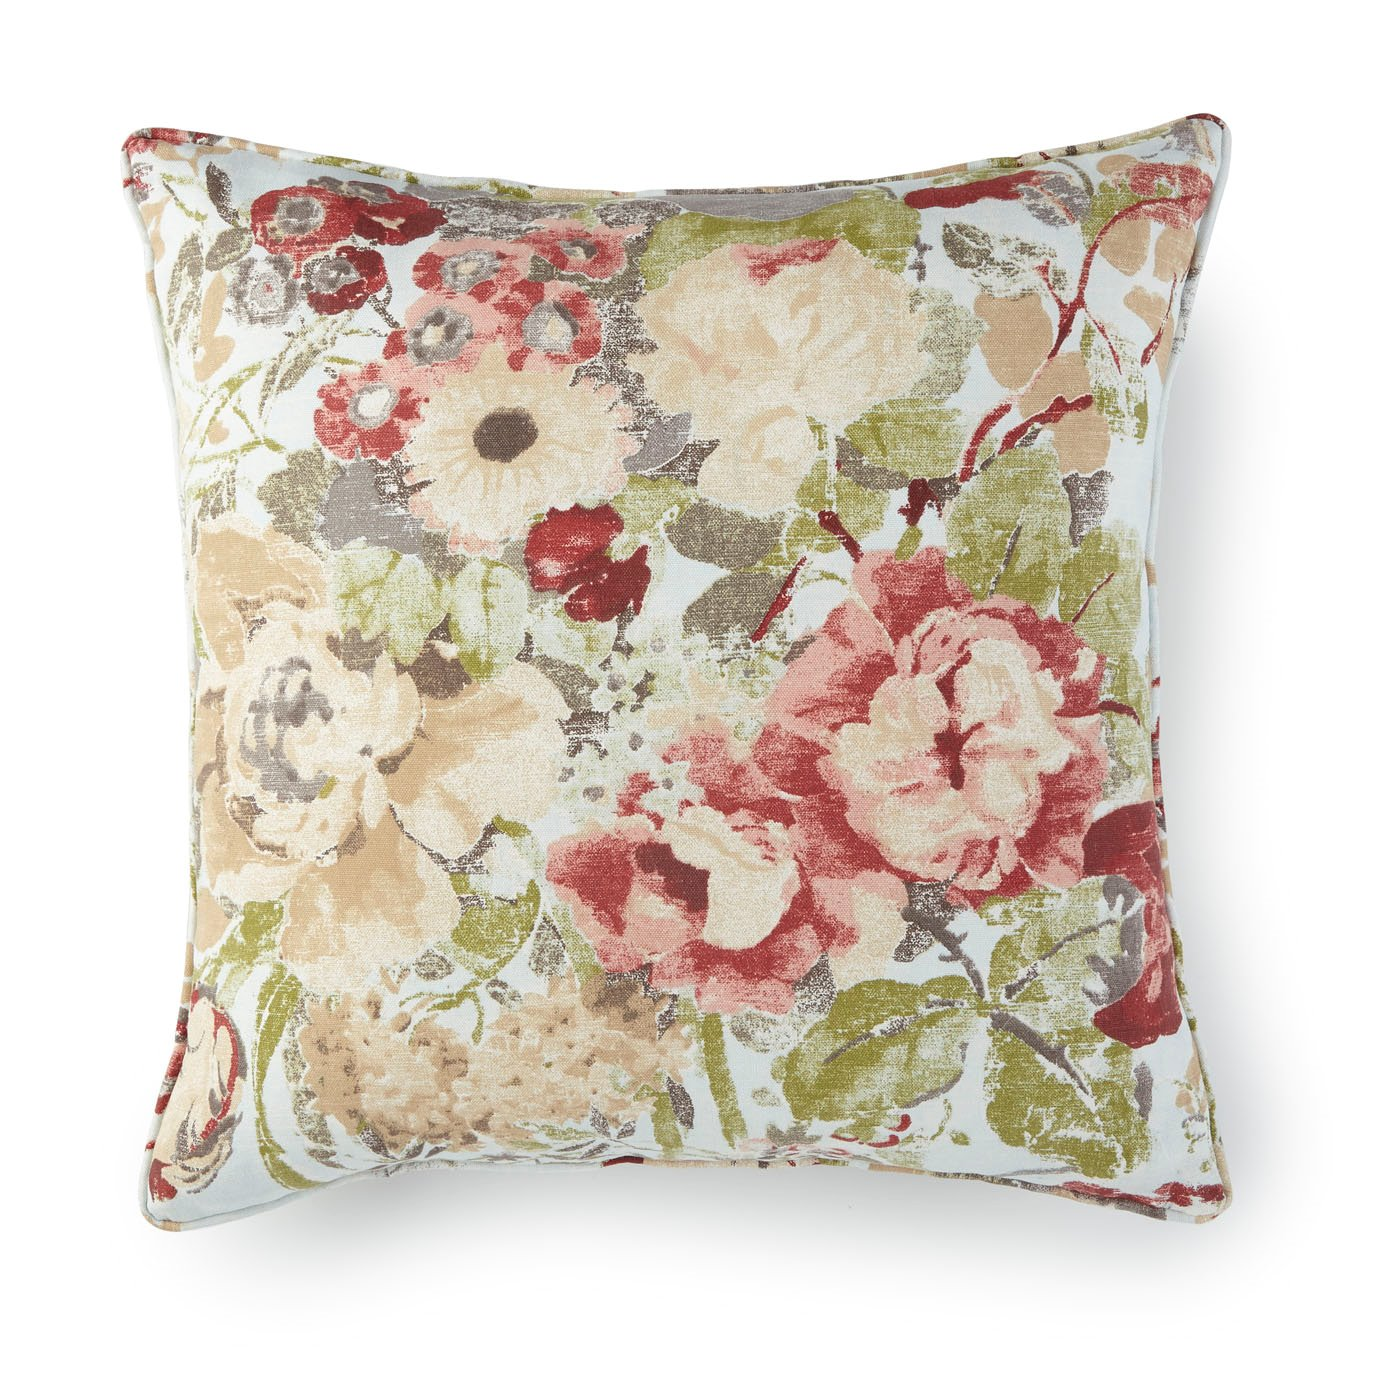 Lorraine 20X20 Pillow